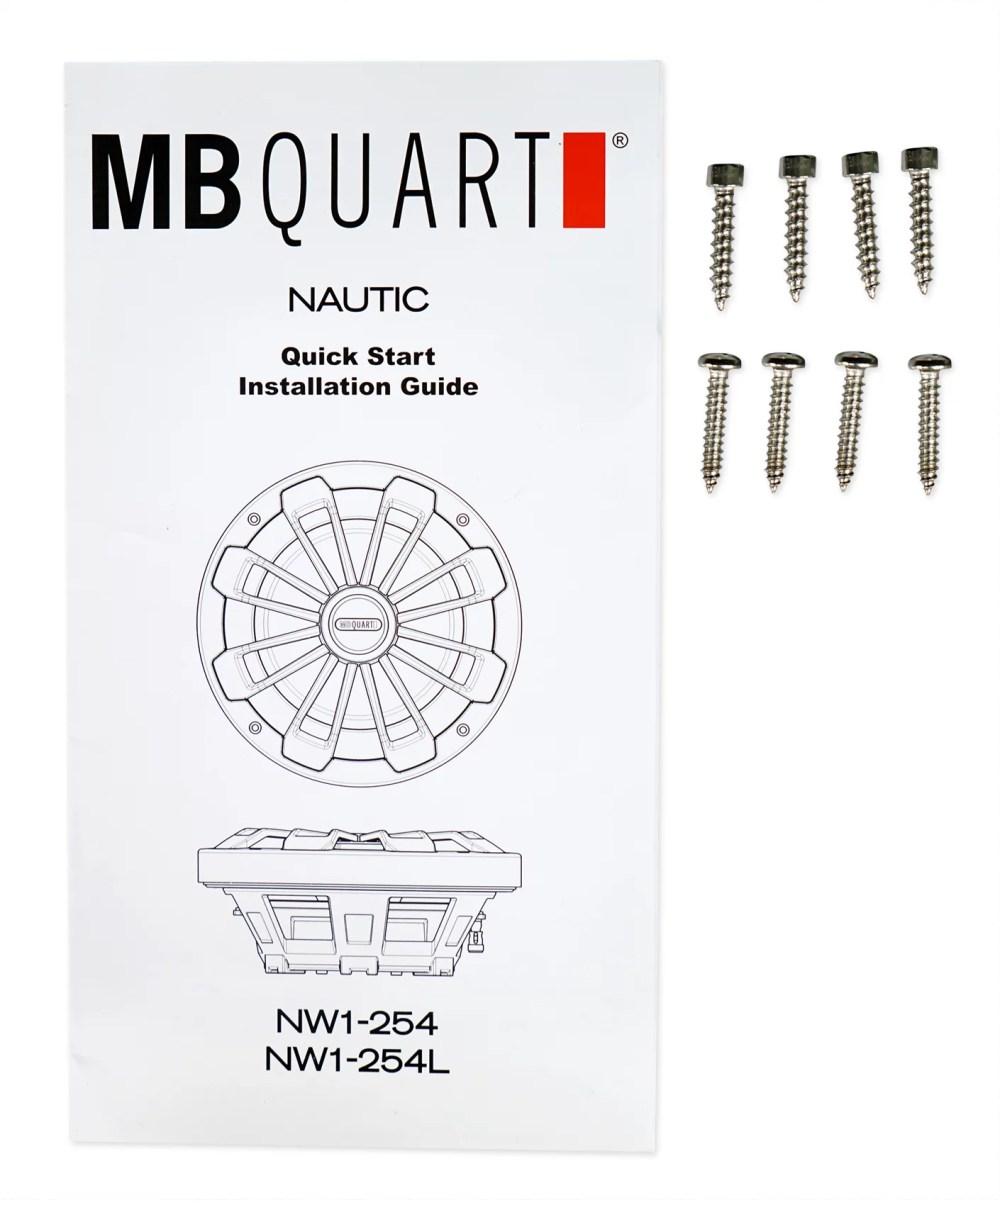 medium resolution of mb quart nw1 254l 10 600w slim marine subwoofer w led s mono amplifier wires walmart com